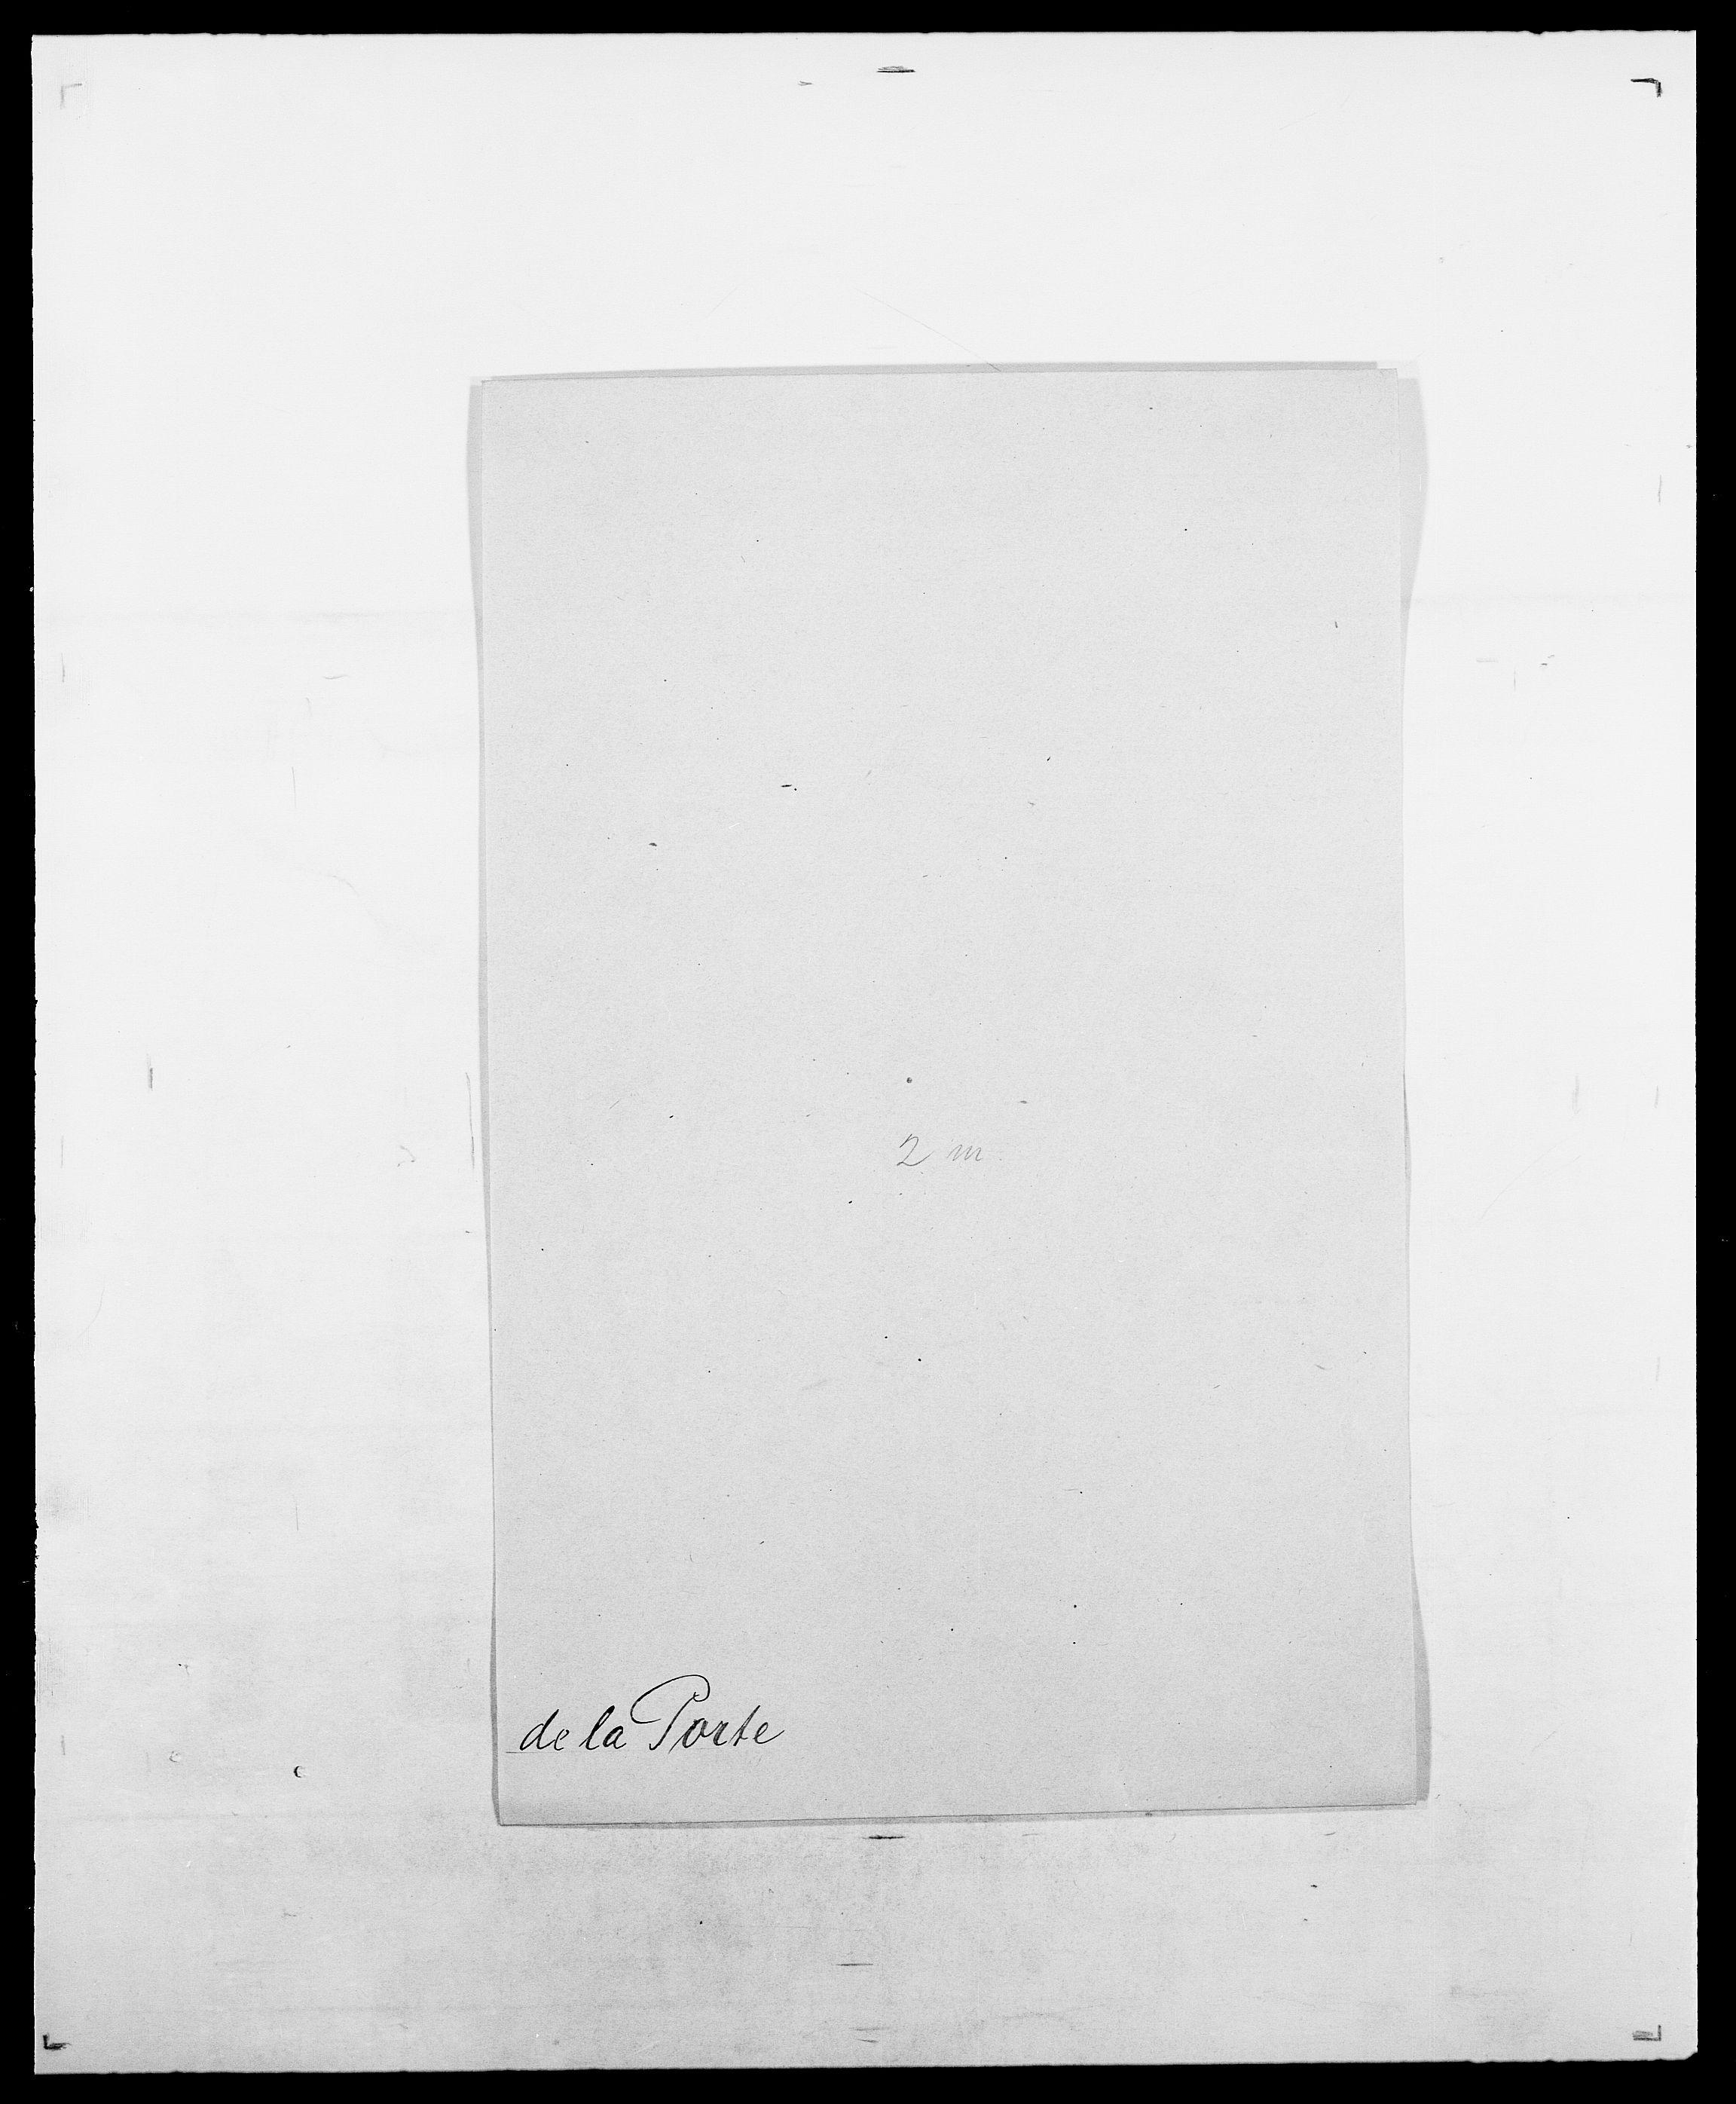 SAO, Delgobe, Charles Antoine - samling, D/Da/L0031: de Place - Raaum, s. 243